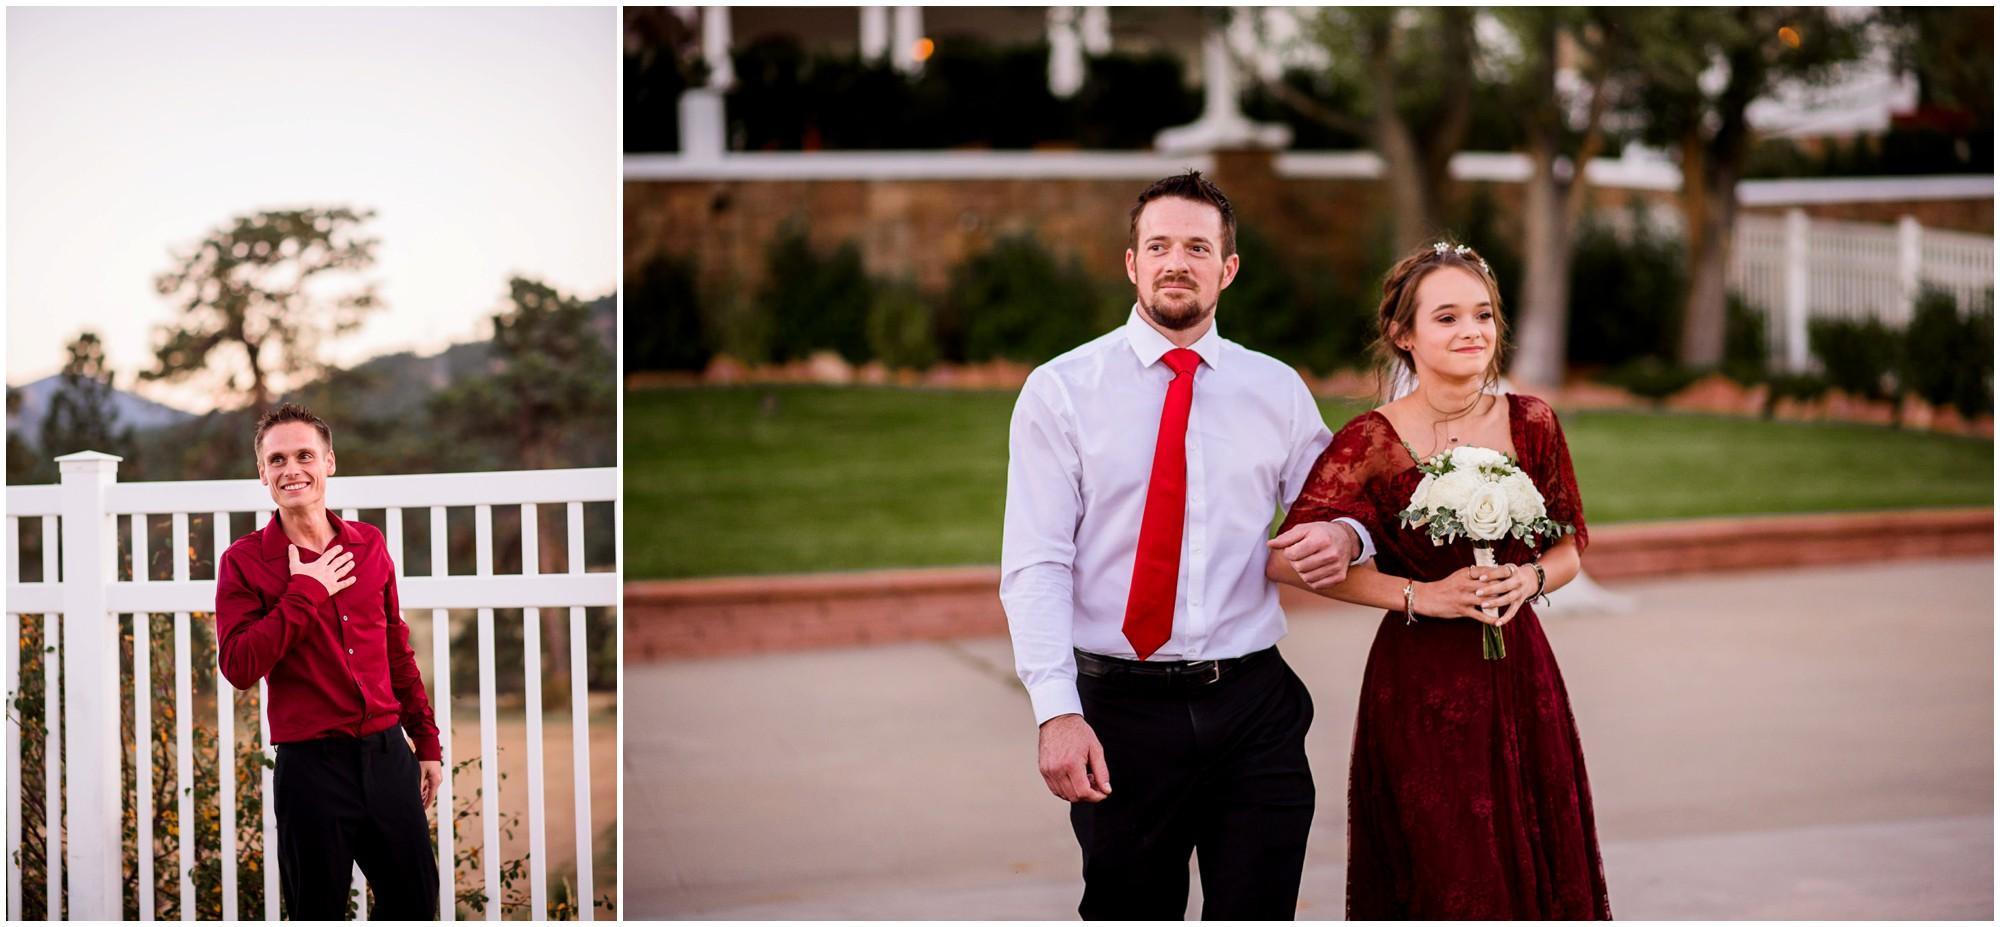 178-Estes-Park-Stanley-hotel-fall-wedding.jpg